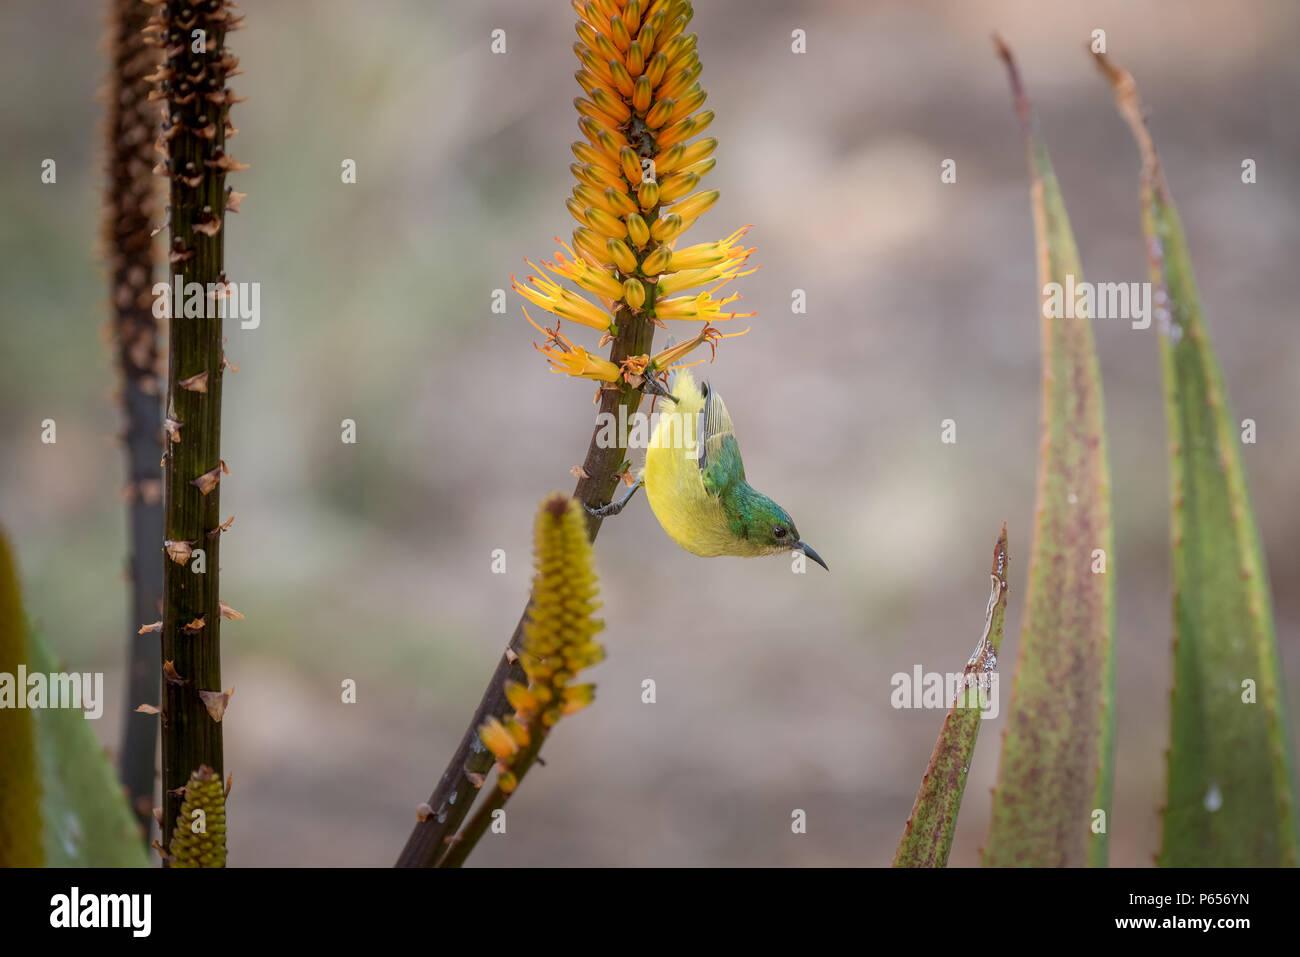 Female Sunbird on colourful flower - Stock Image